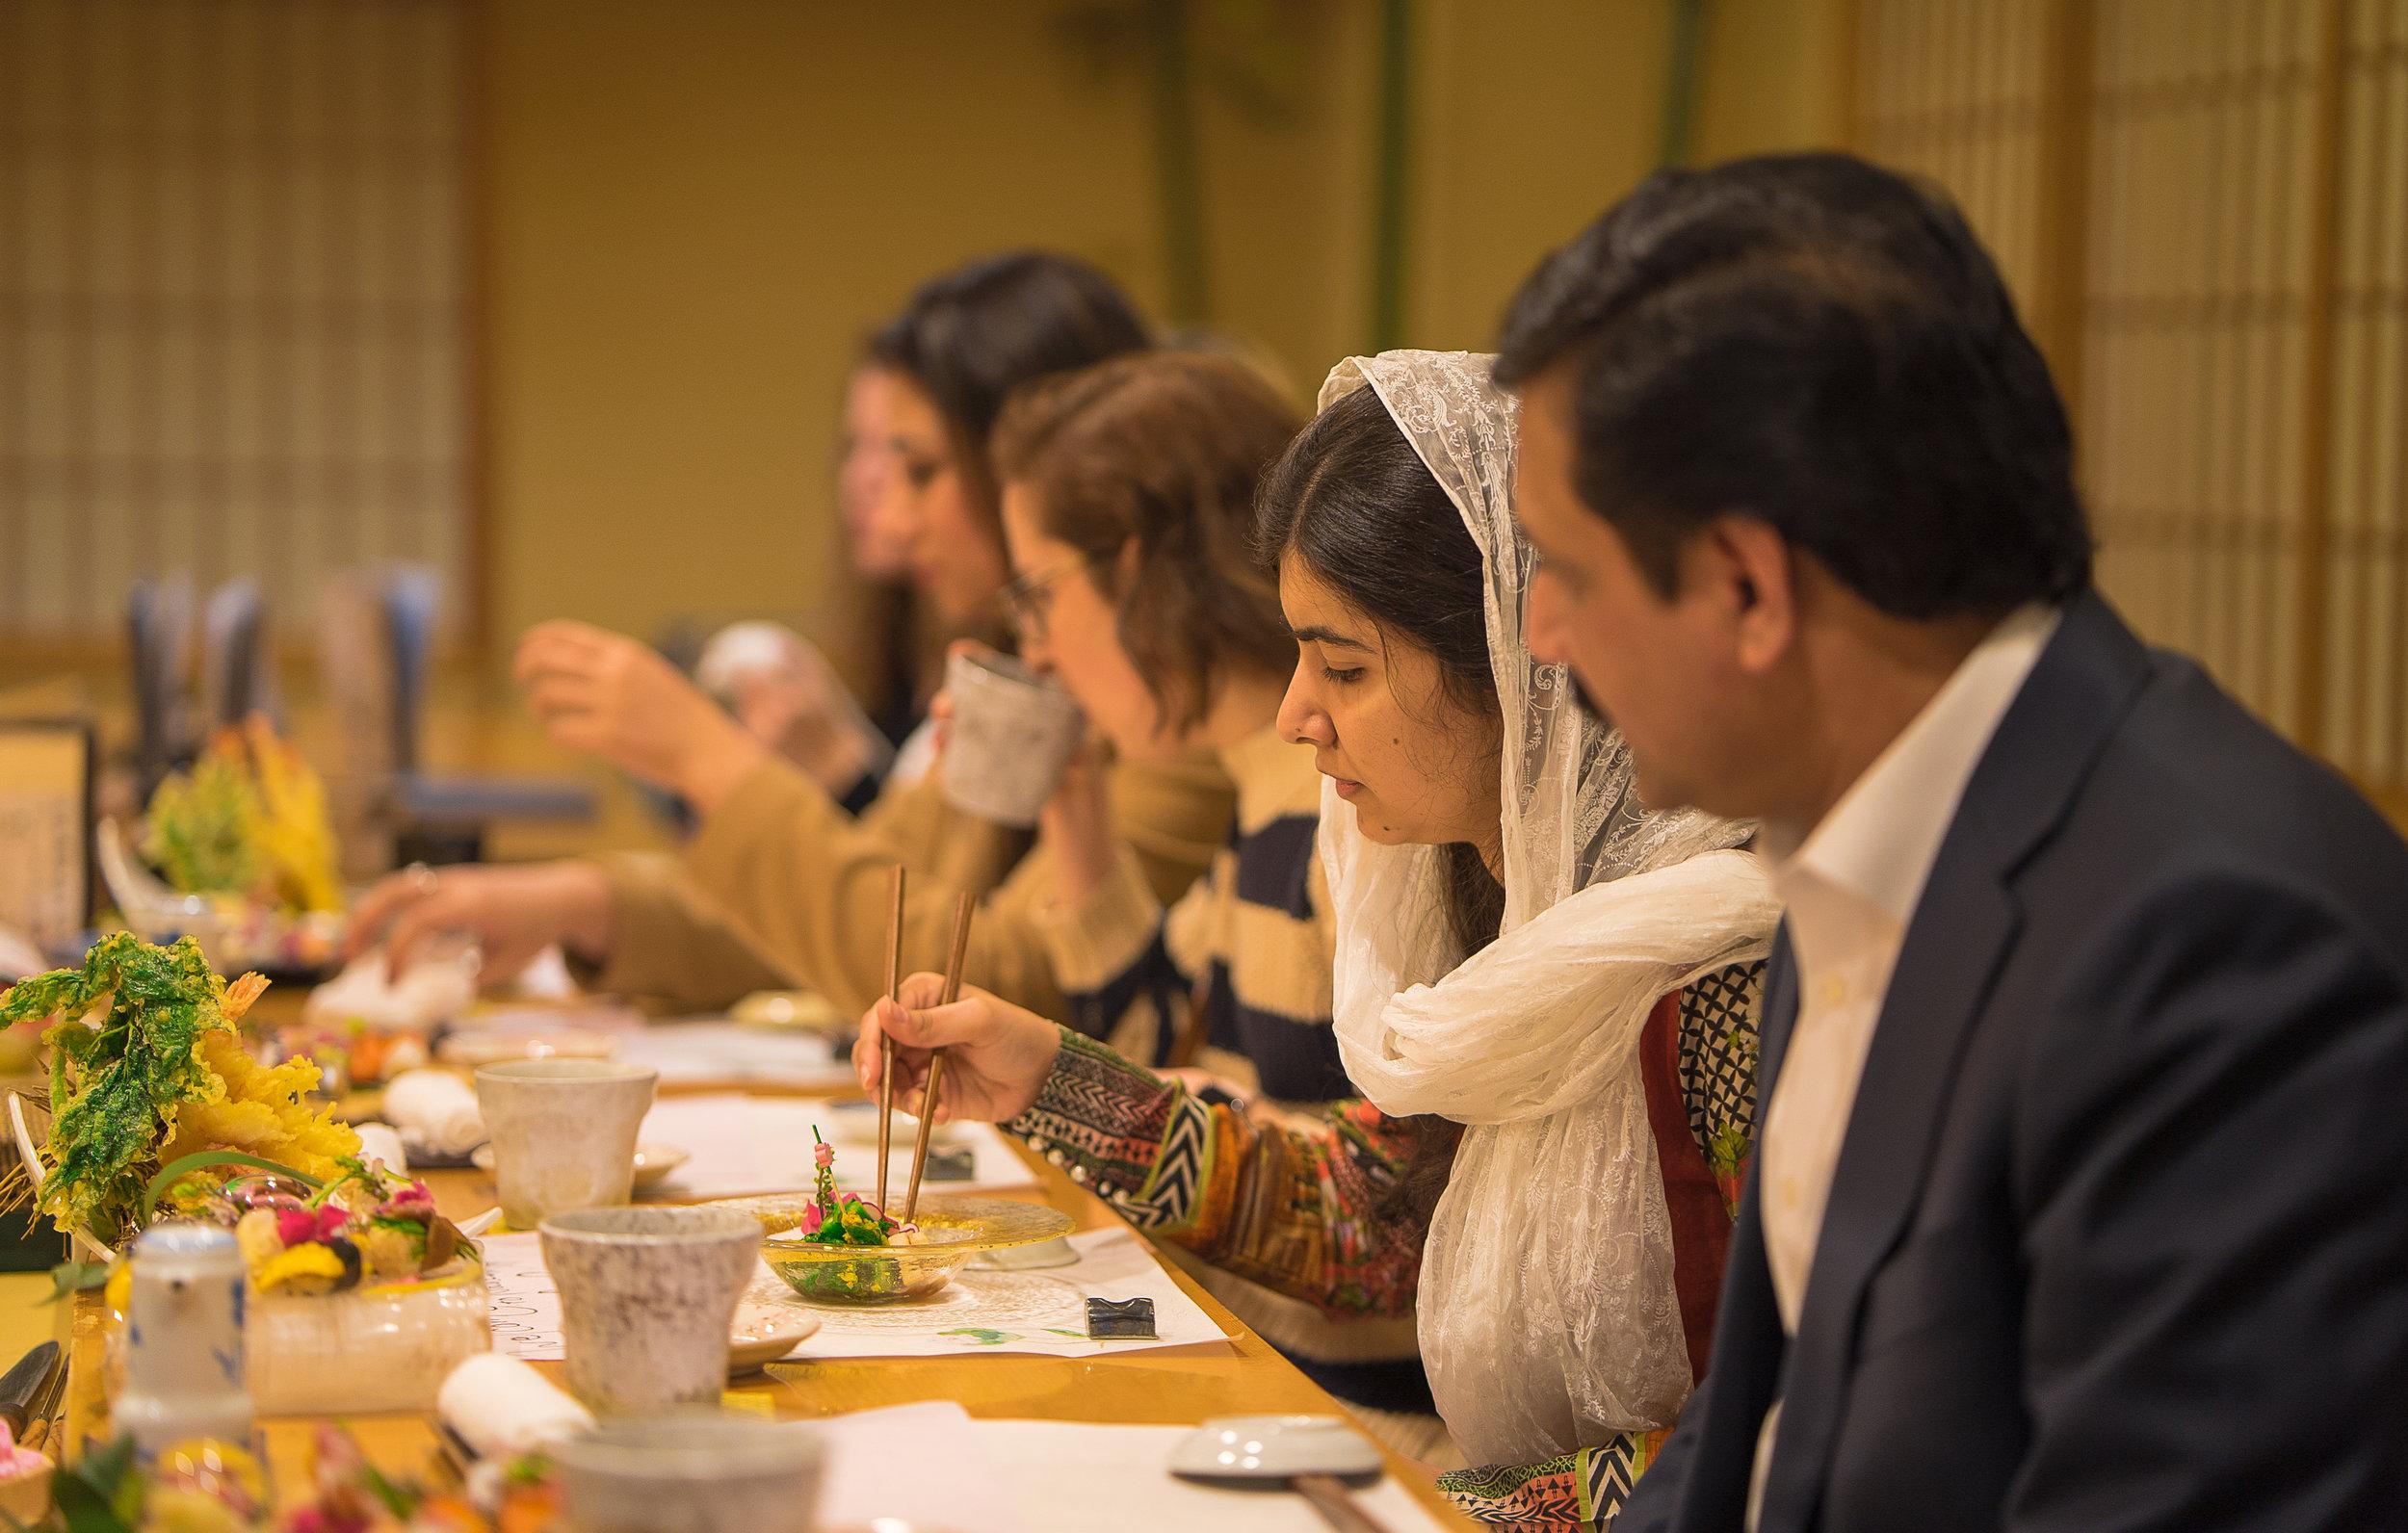 Malala and her father, Ziauddin, sampling dishes at Nadeshiko Sushi. (Courtesy of Amarachi Nwosu / Malala Fund)